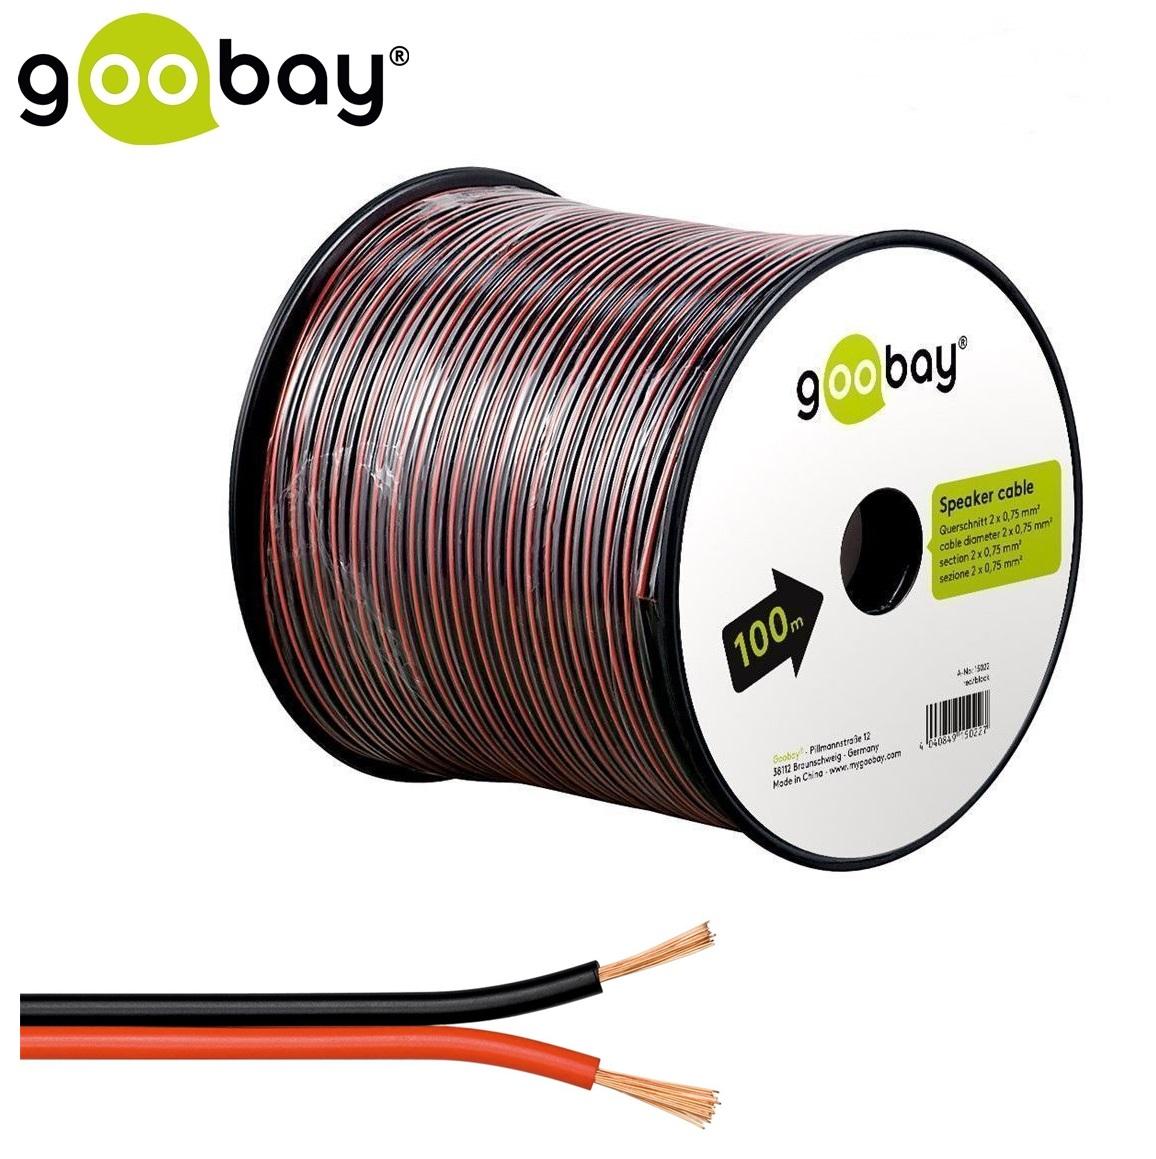 Speaker cable (100.0m Макара 2 x 0.75 mm)GOOBAY